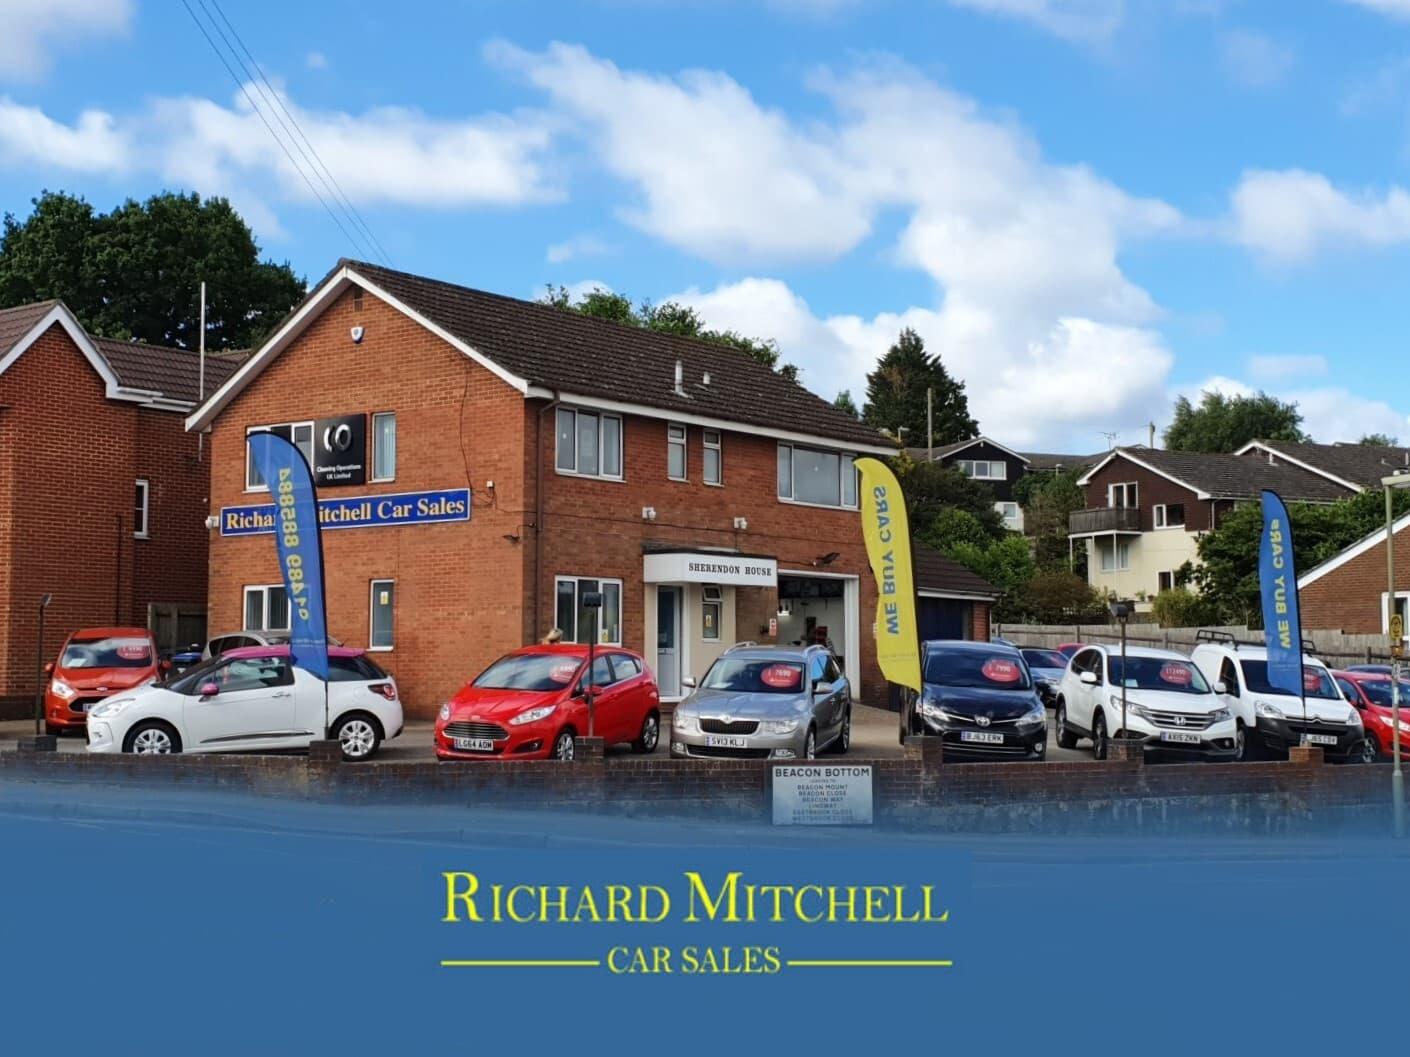 70165268 1355373681285174 2963381654460039168 N - Richard Mitchell Car Sales